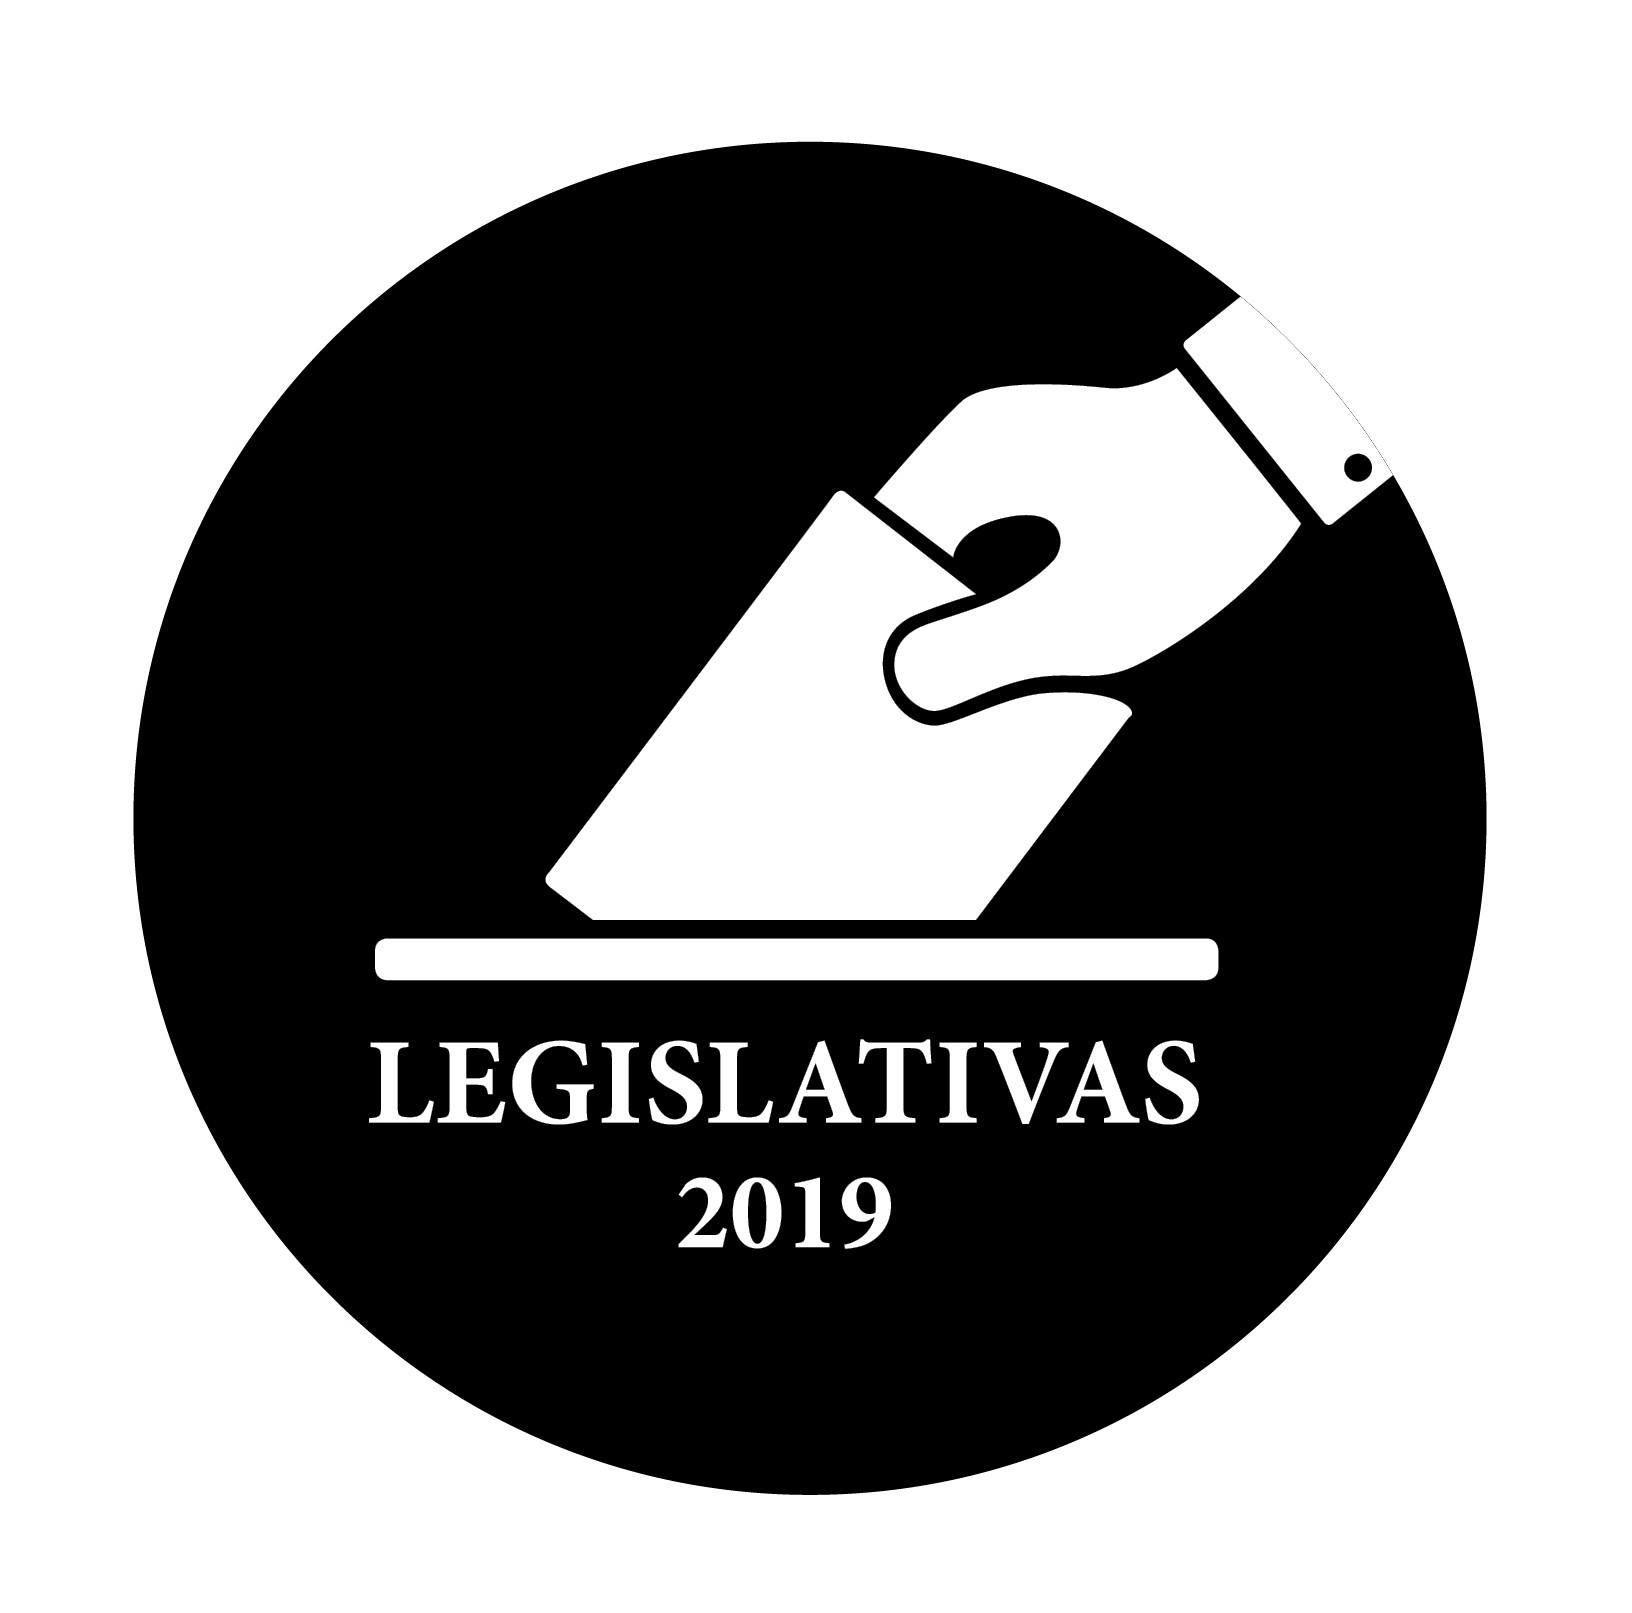 logo legislativas  bola.jpg